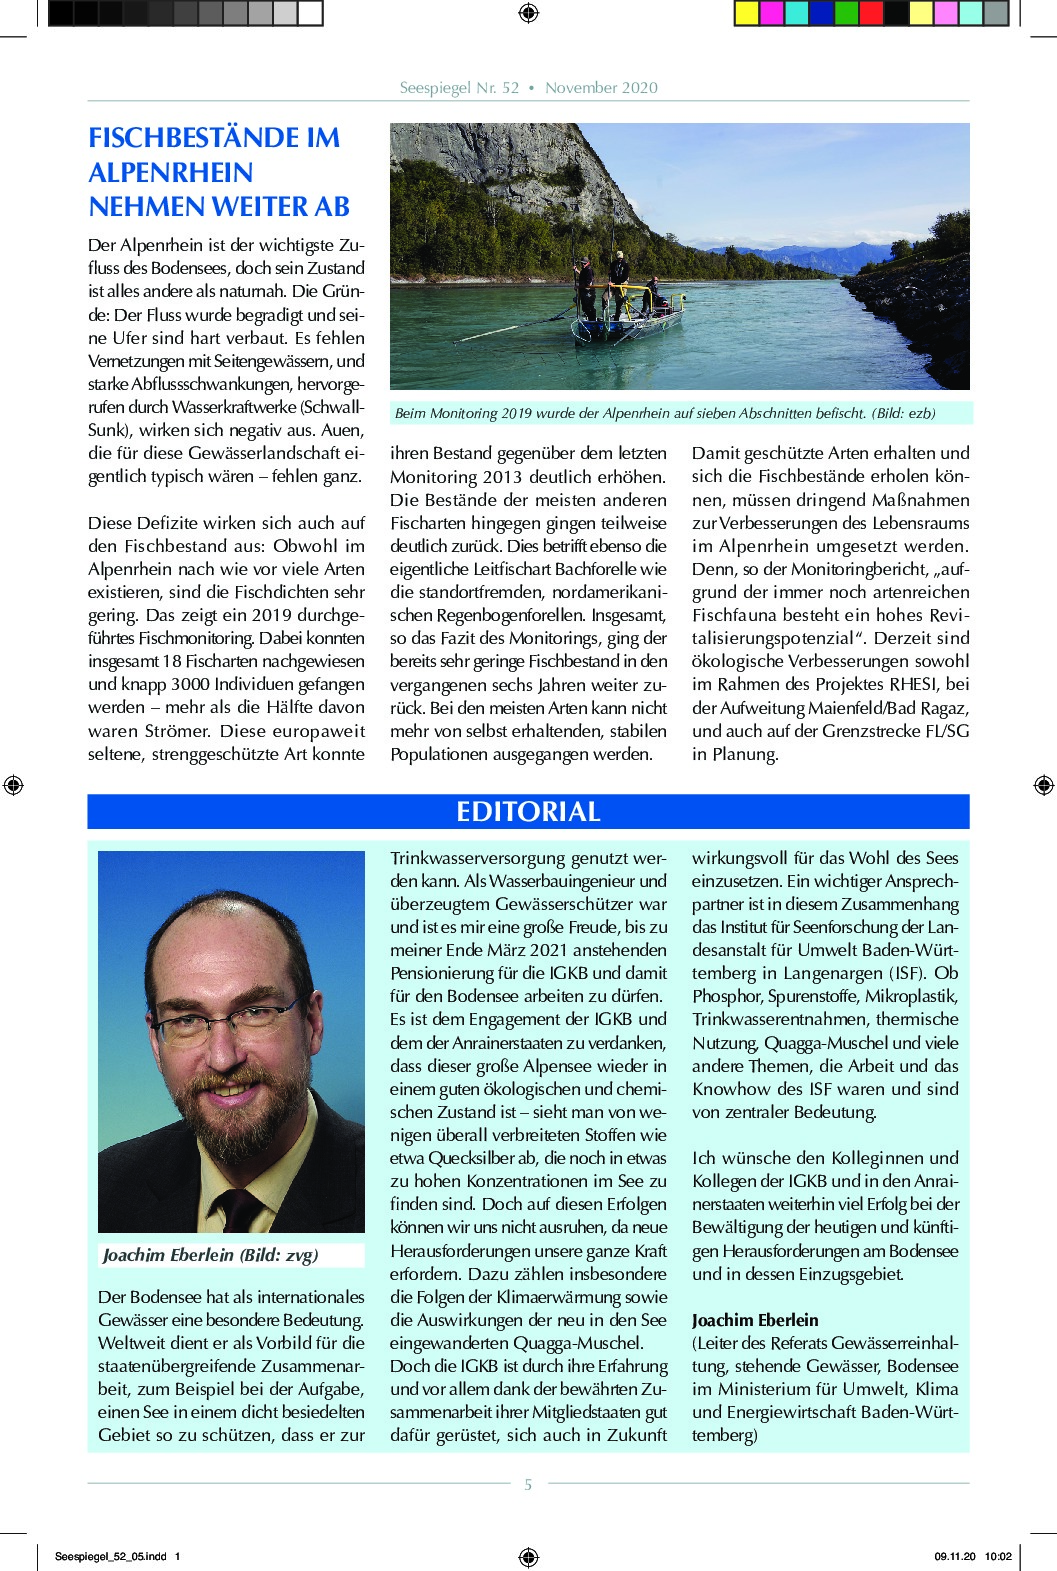 thumbnail of Seespiegel-Nr-52